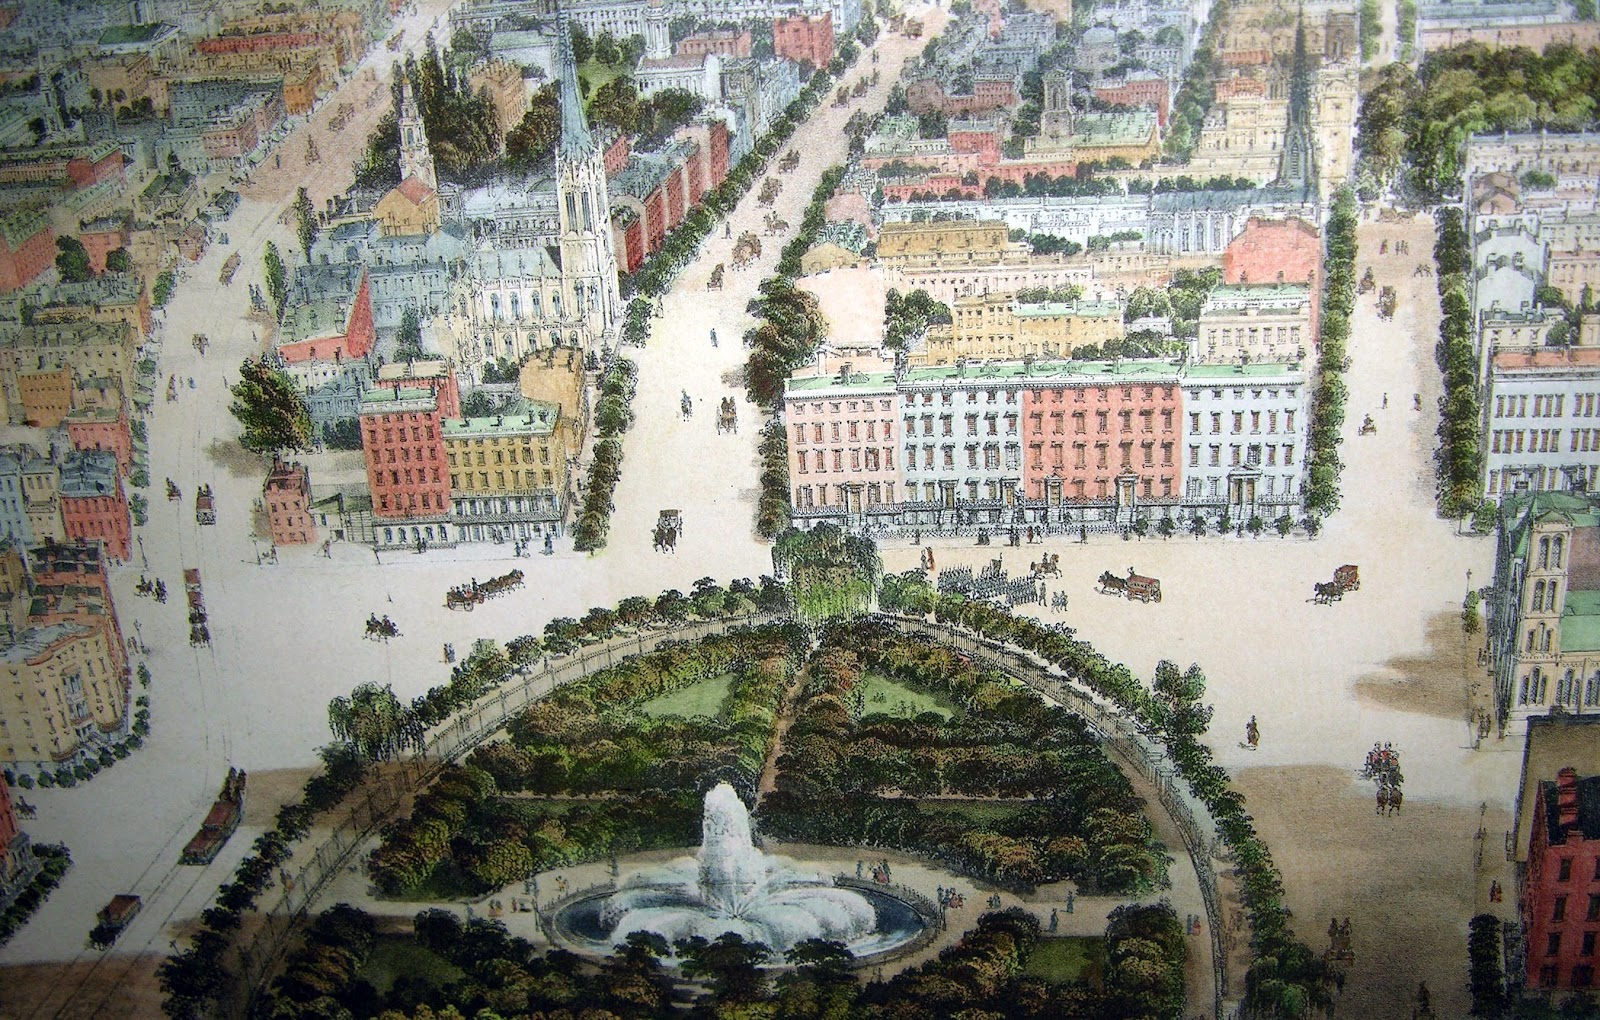 File:New York Union Square 1850.jpg - Wikimedia Commons